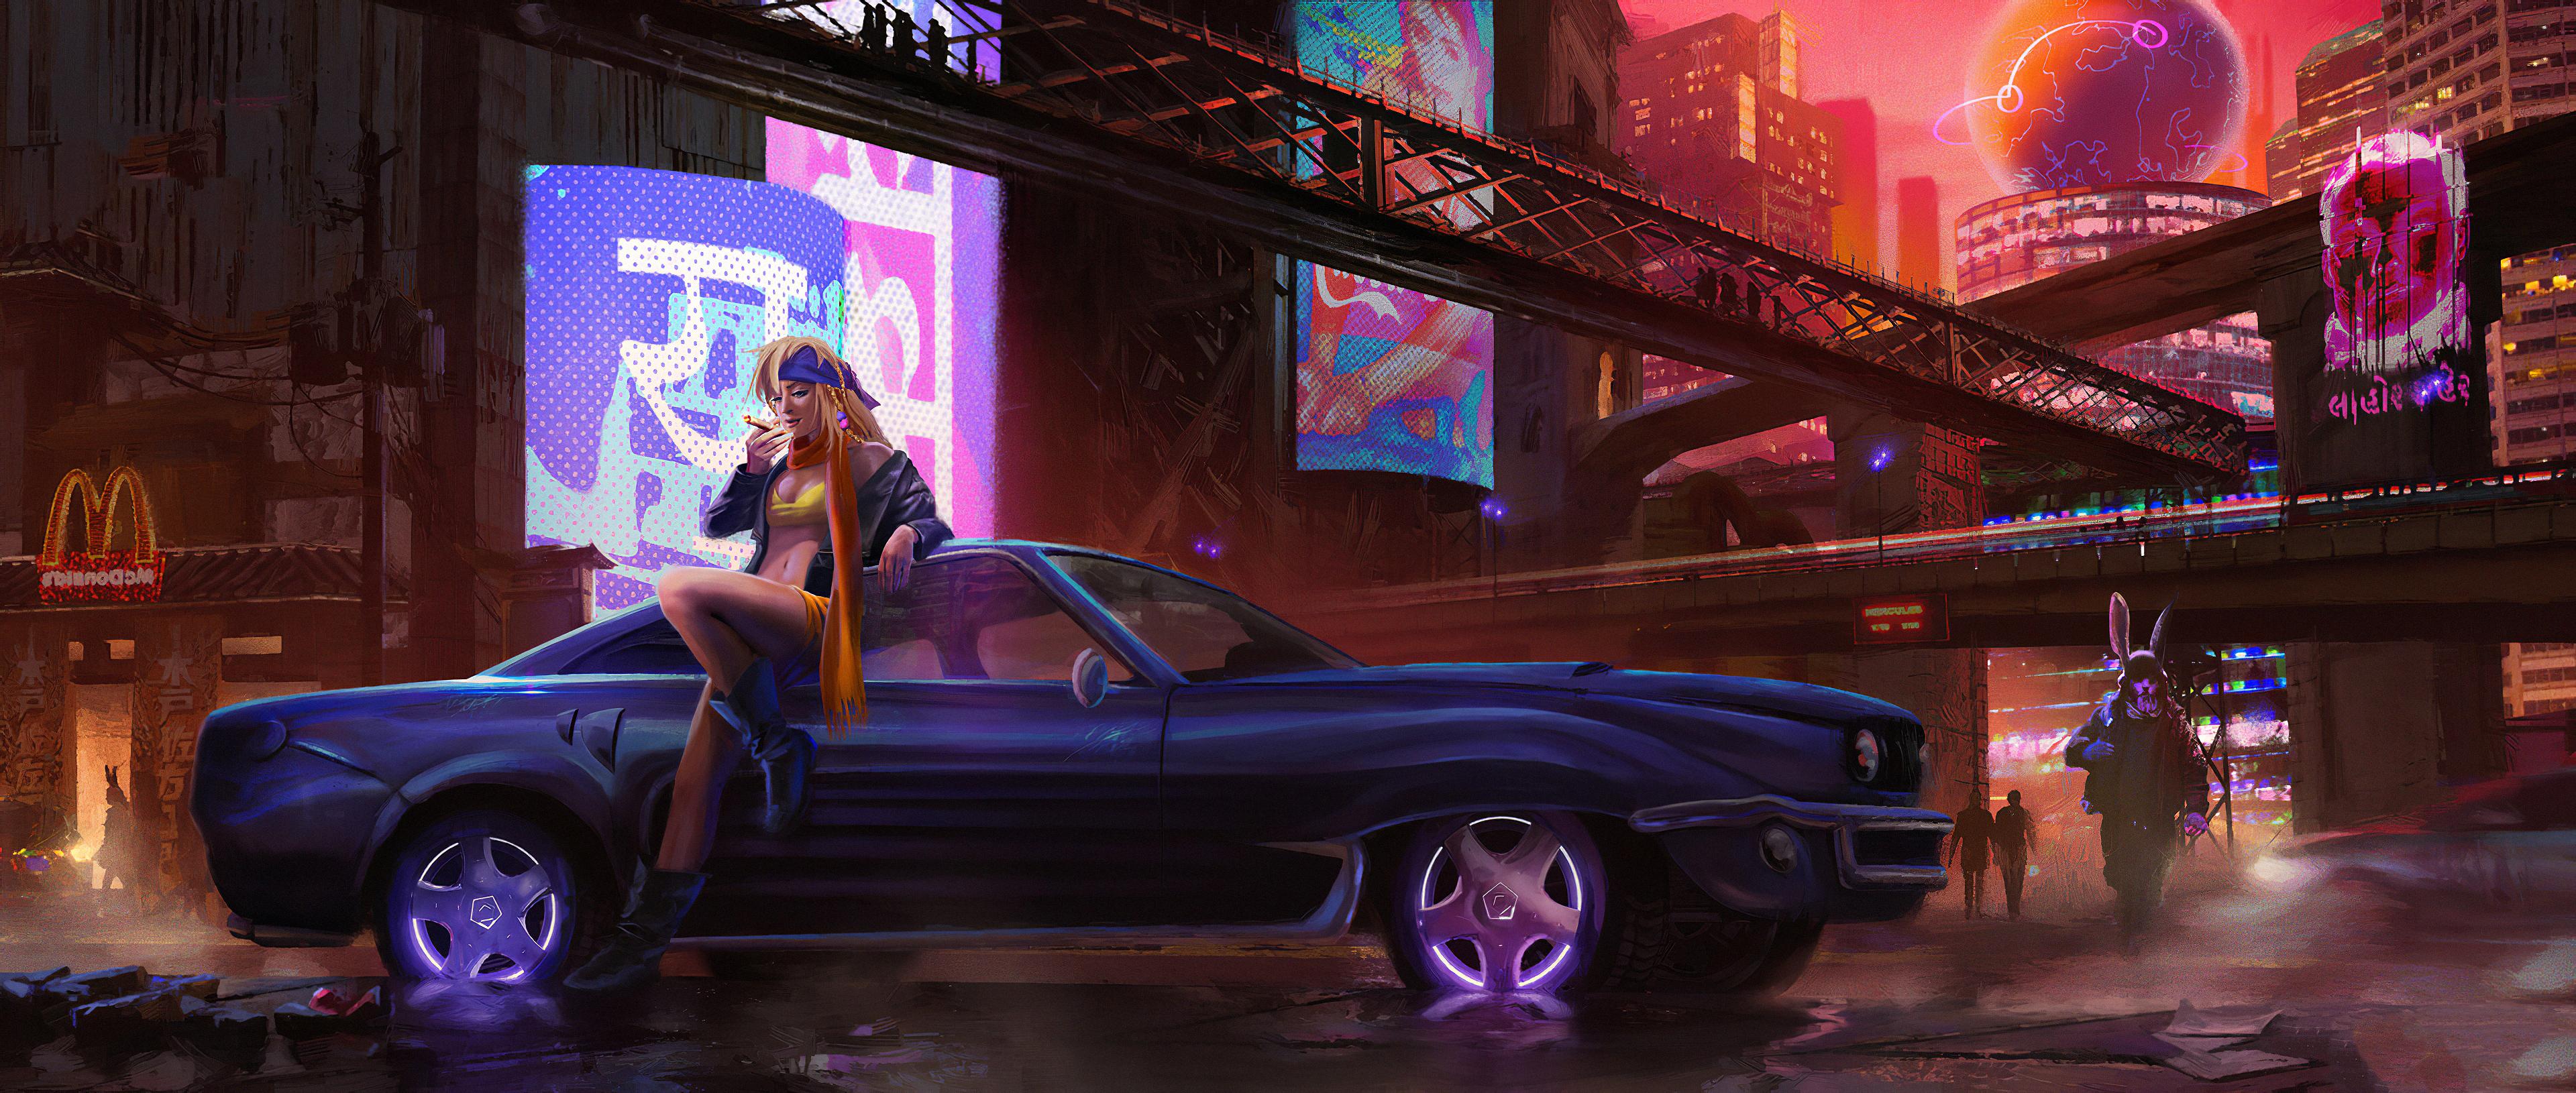 cyber city girl with car 1578255461 - Cyber City Girl With Car -